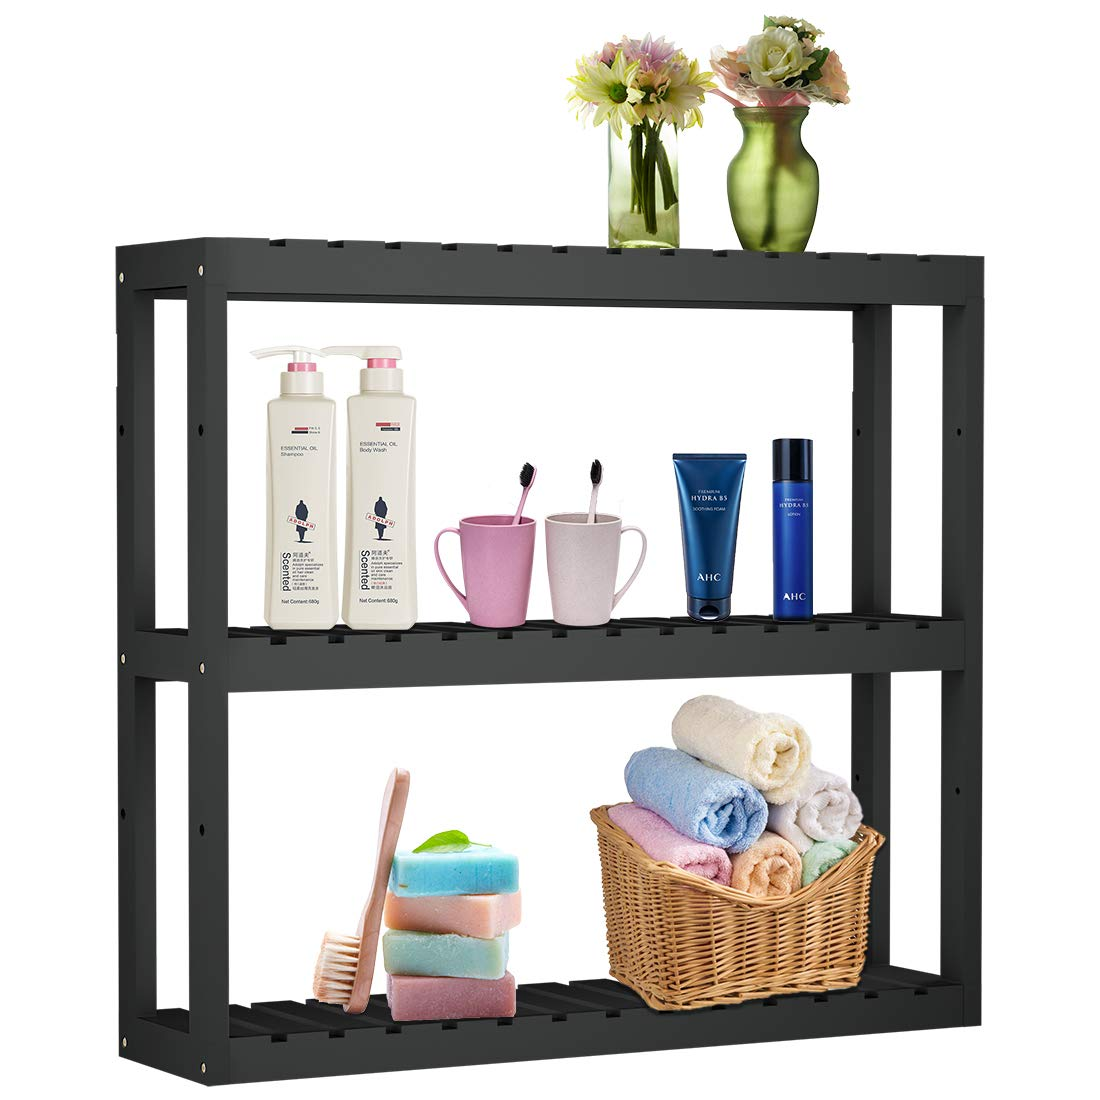 Bathroom Shelf 3-Tier Wall Mount Shelf Storage Rack Adjustable Layer Living Room Kitchen Free Standing Multifunctional Utility Black by Domax